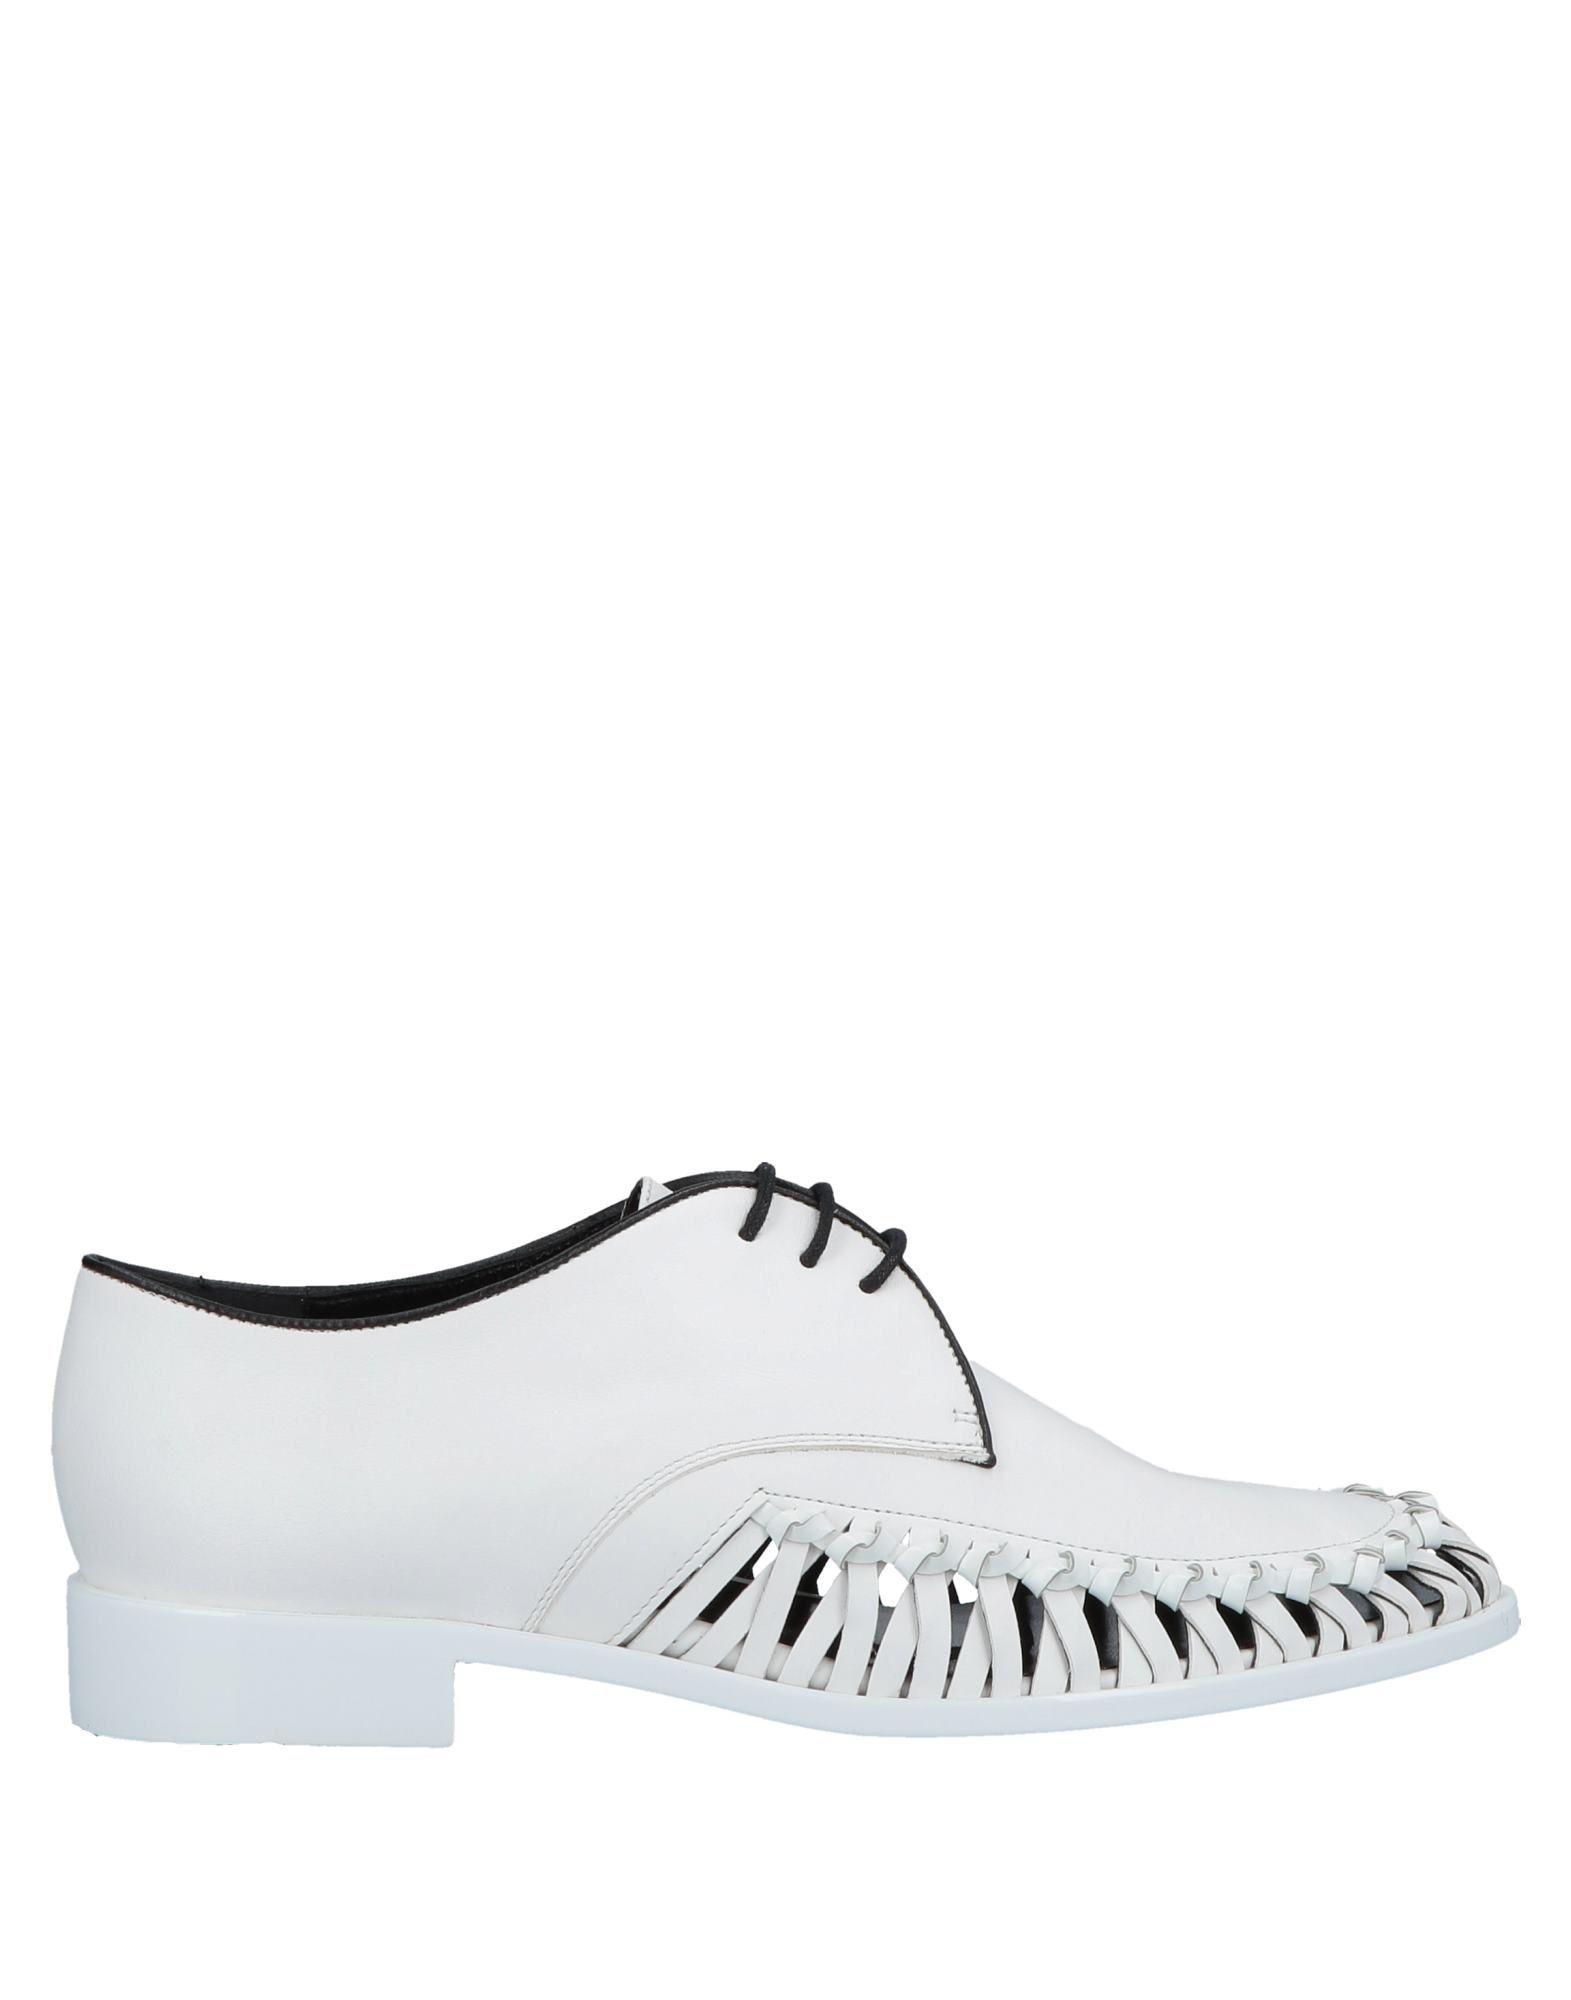 STEPHEN VENEZIA Обувь на шнурках